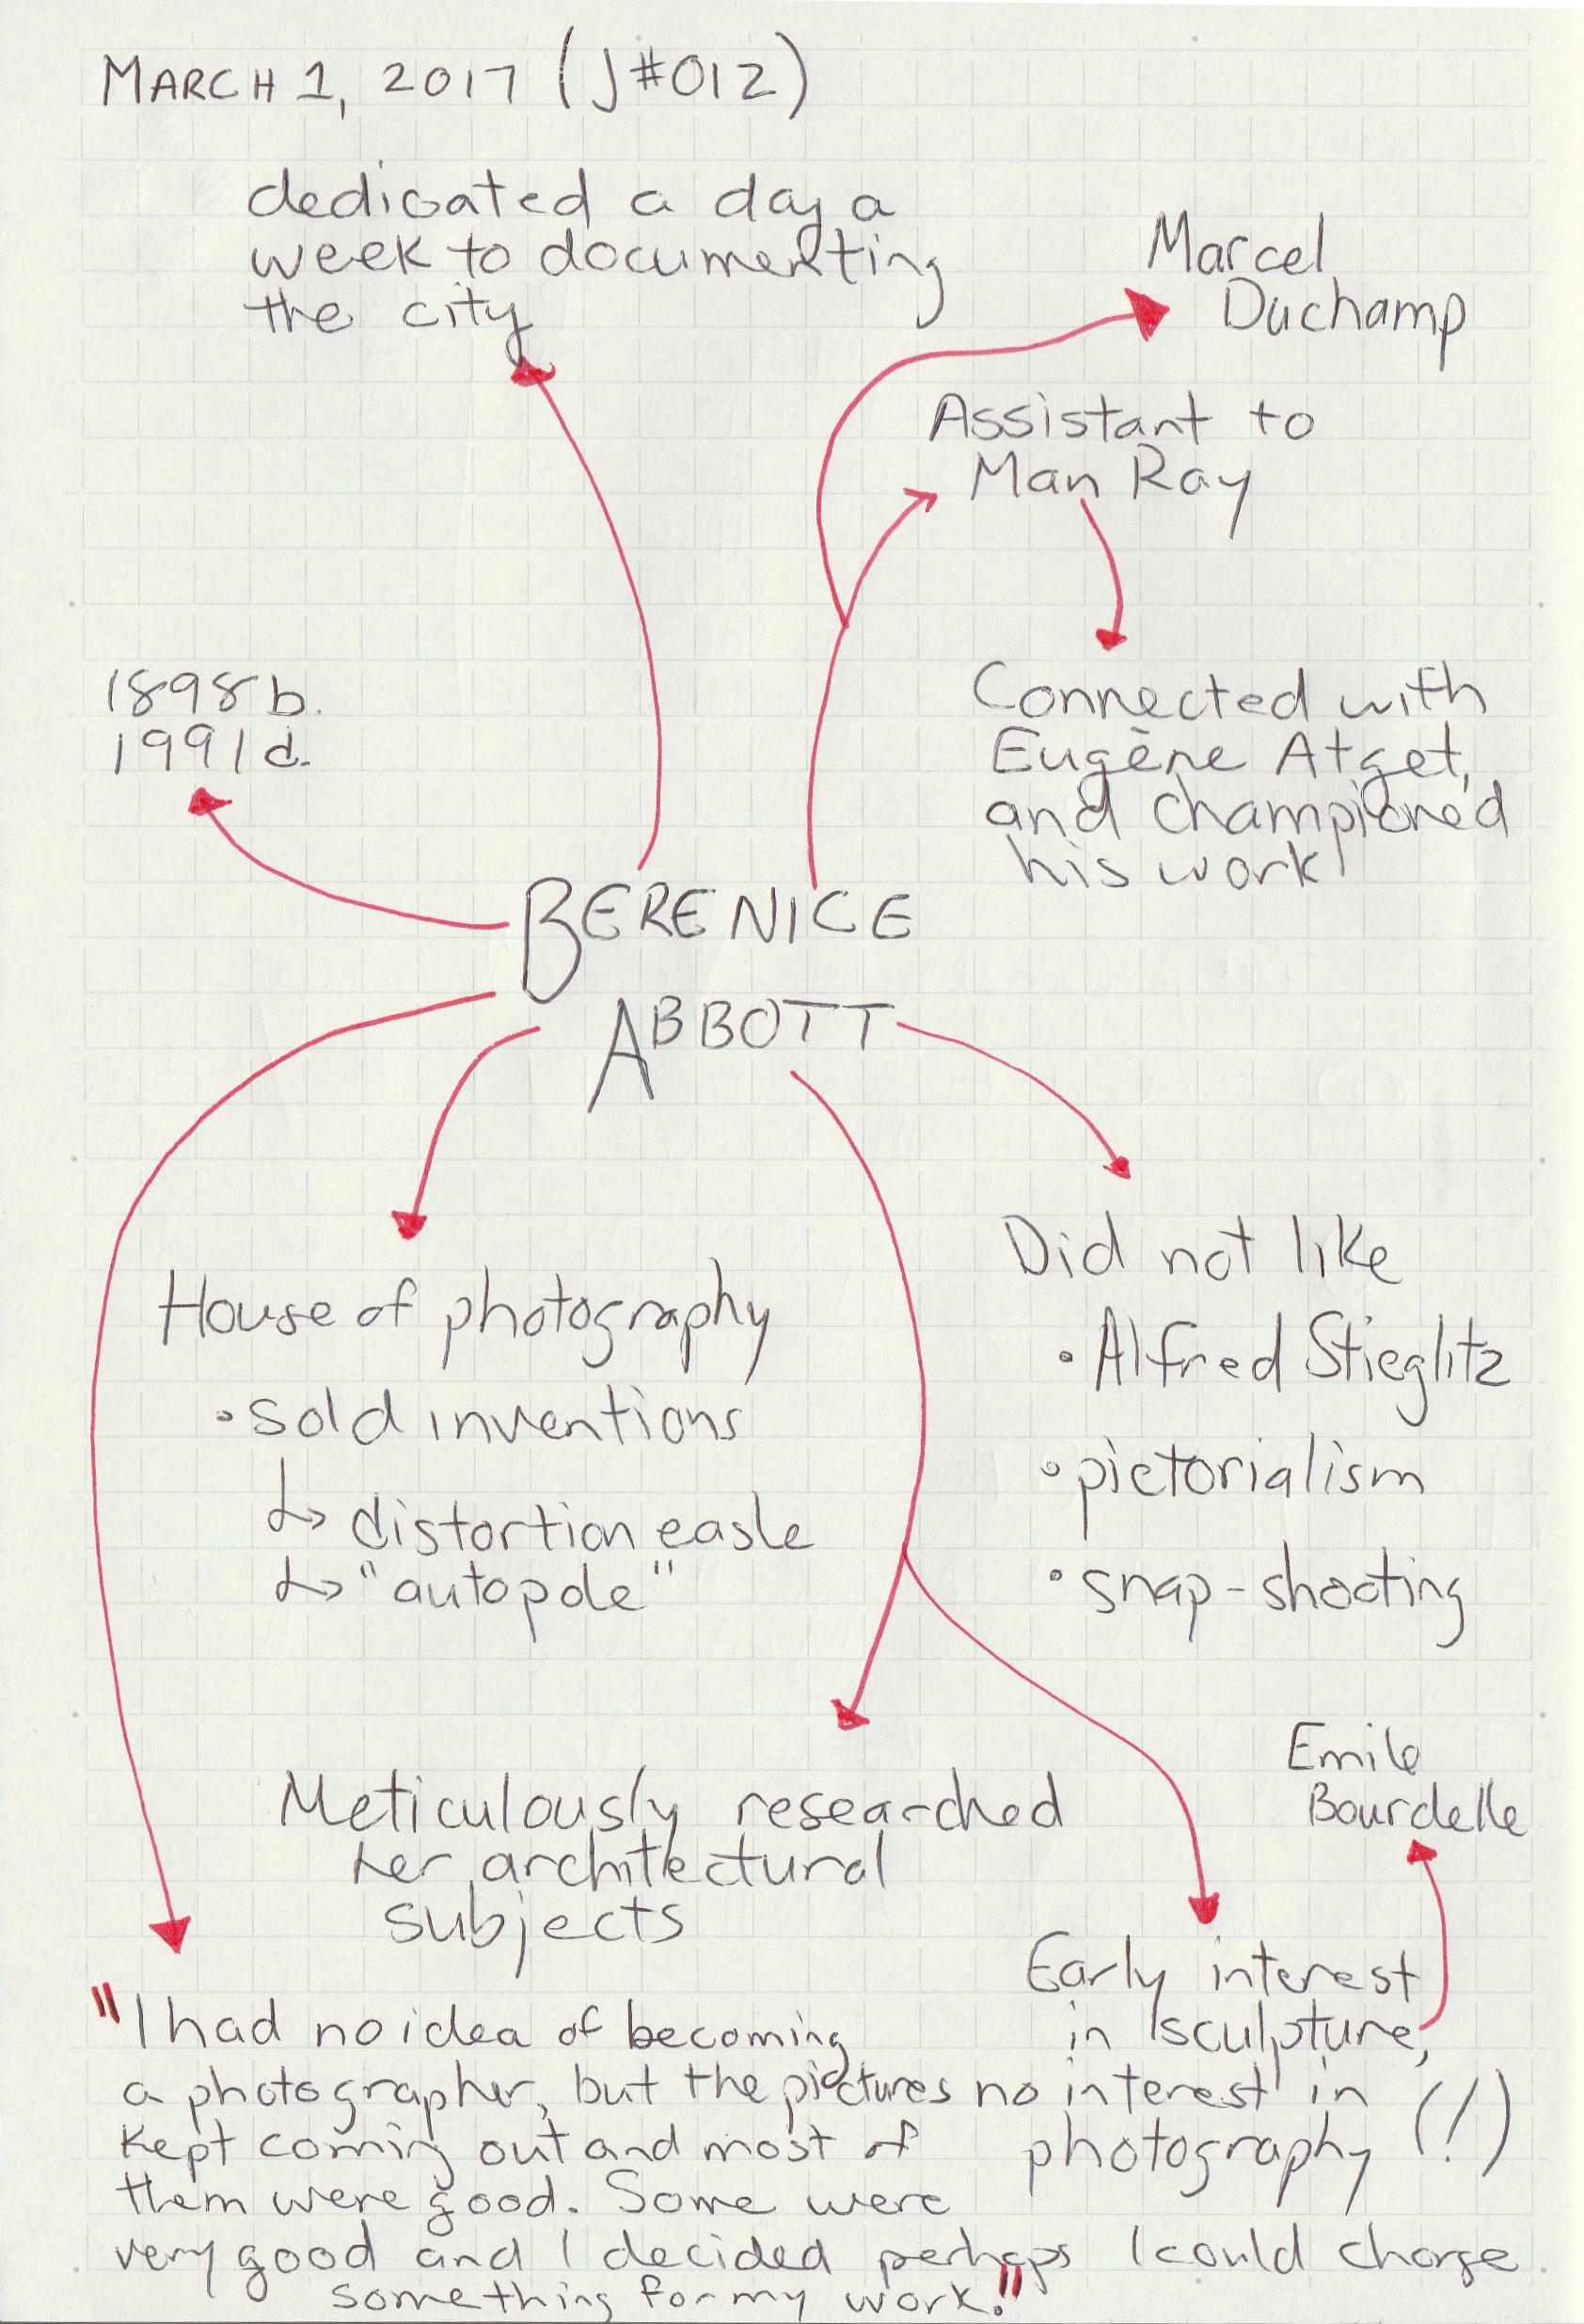 Berenice Abbott; March 1, 2017 Journal #012